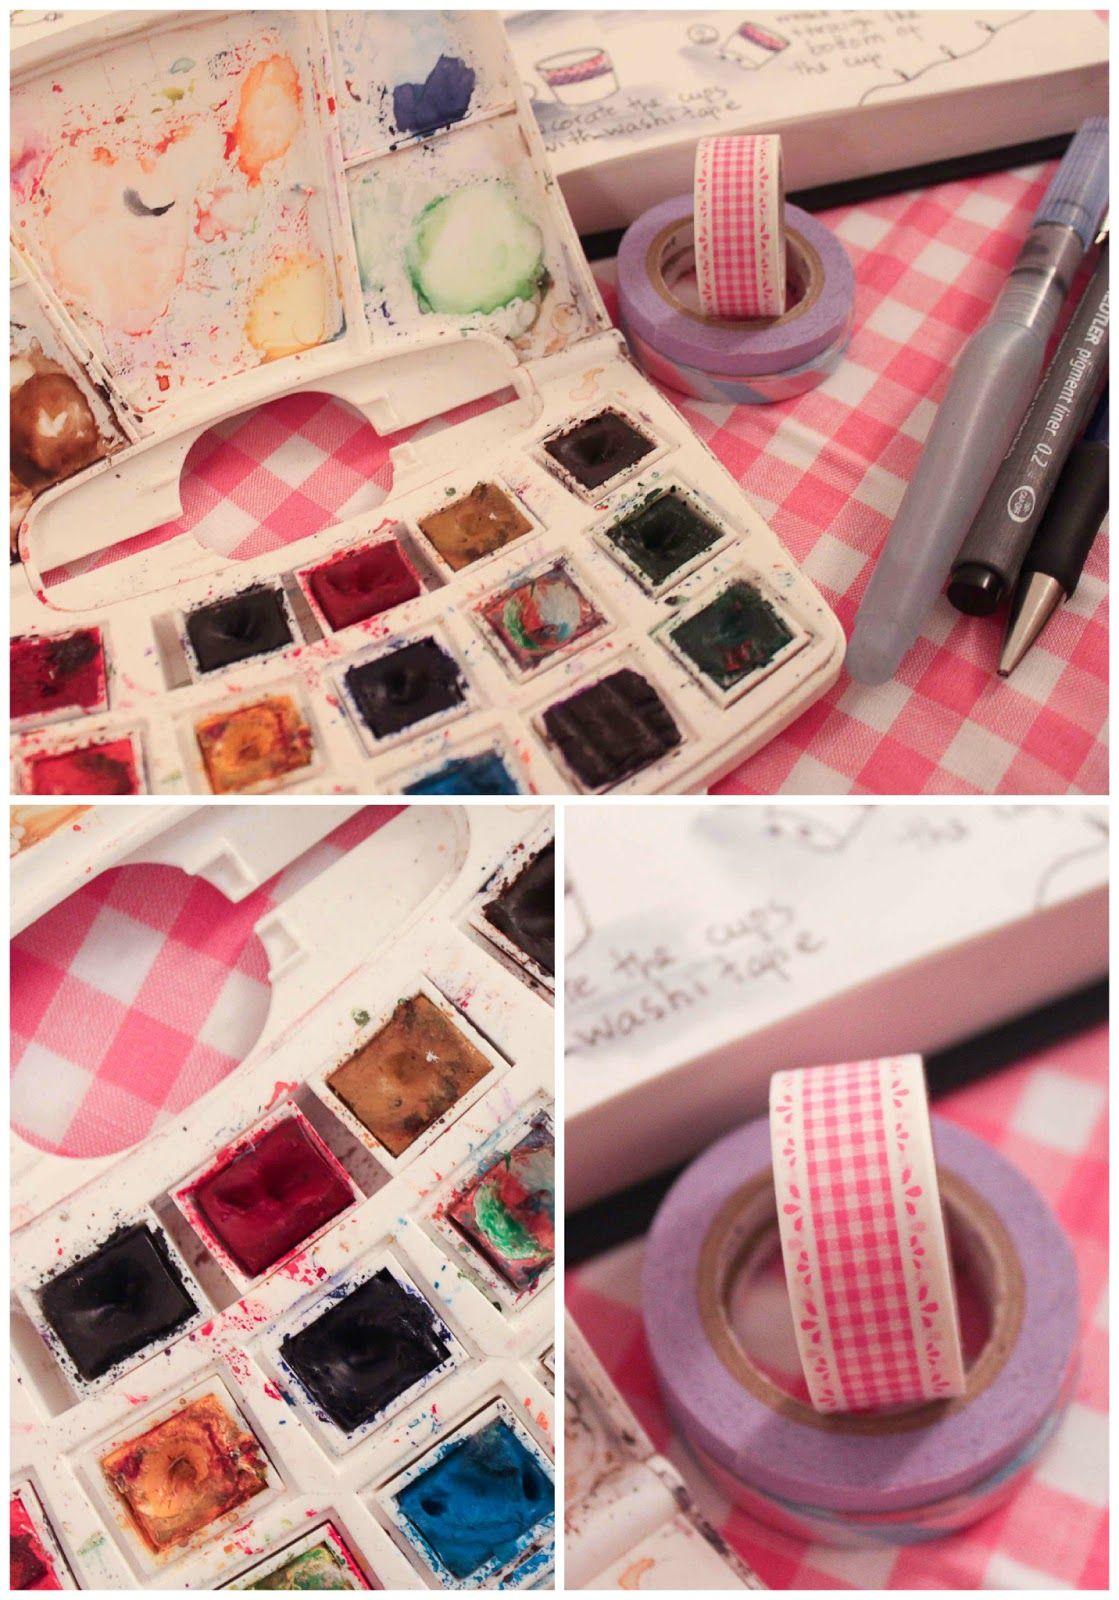 make-up (nice!!)